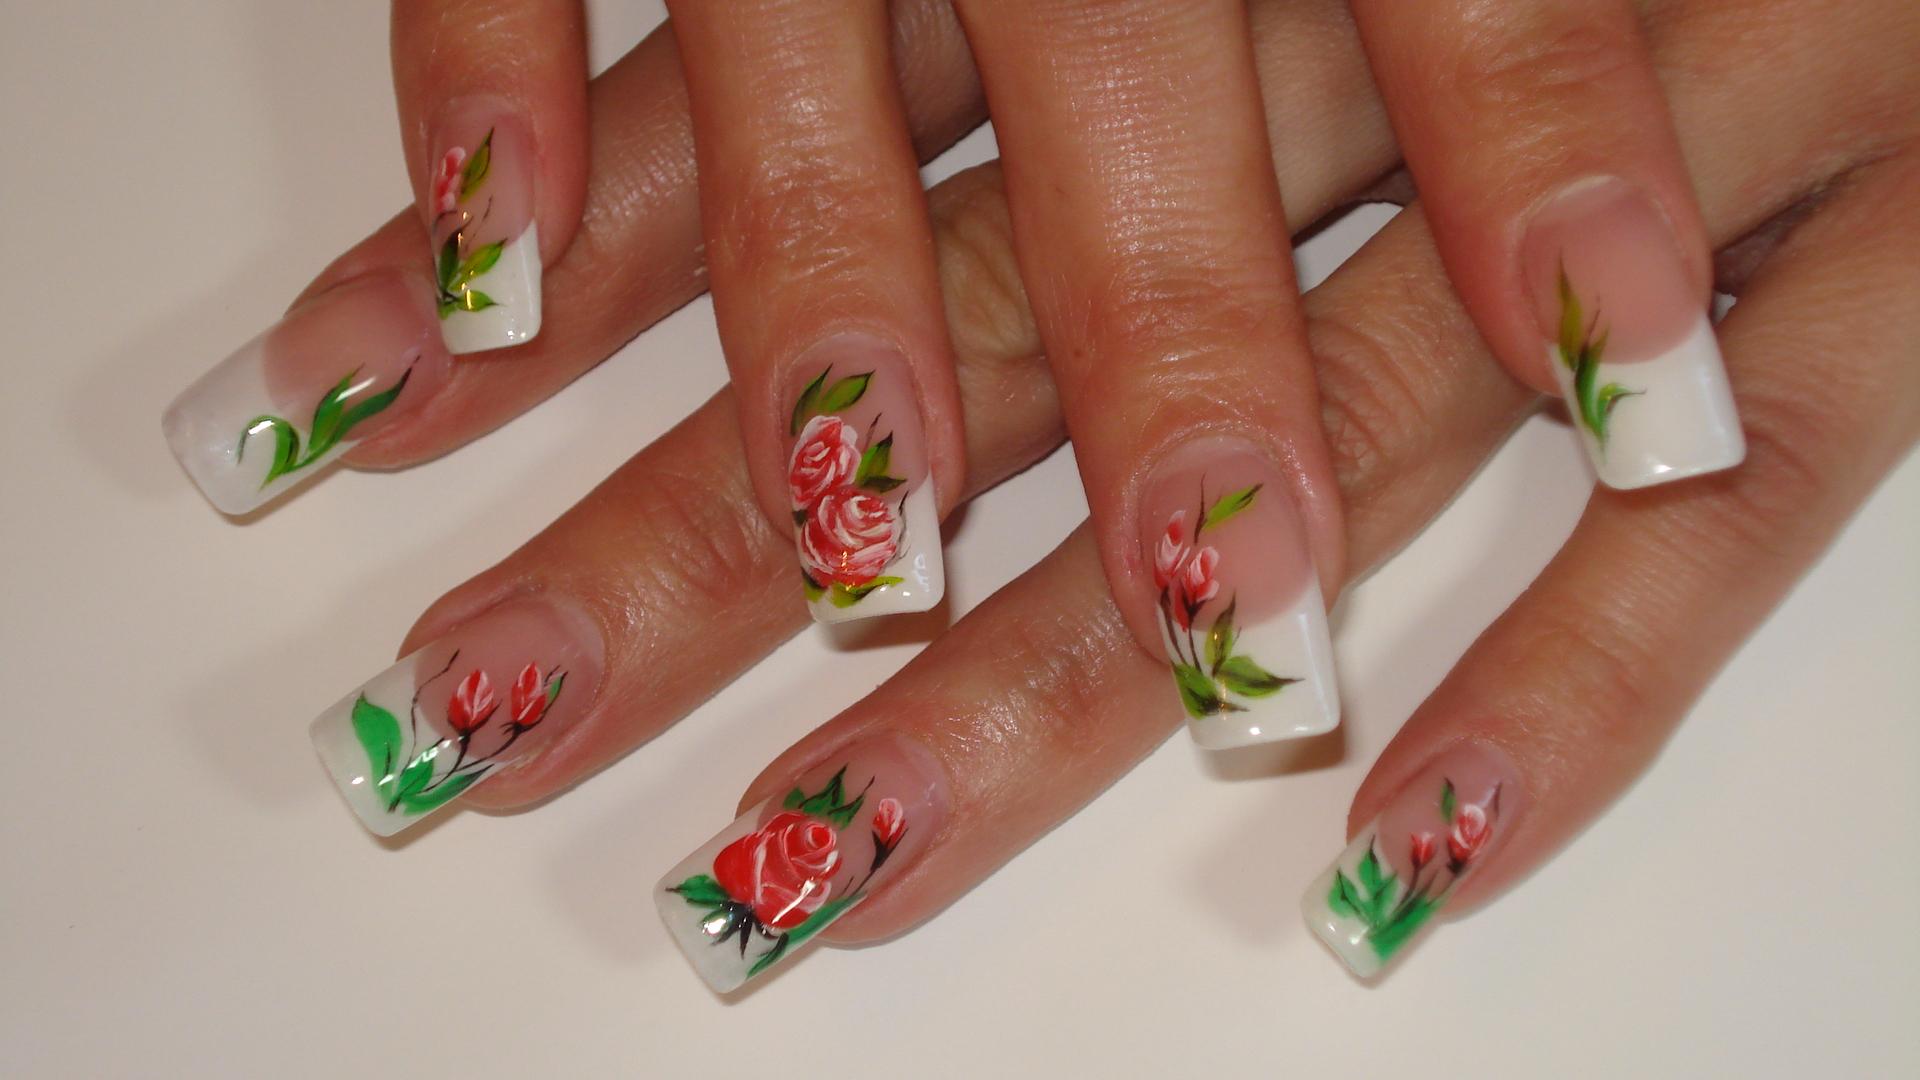 Дизайн ногтей с розами фото 38